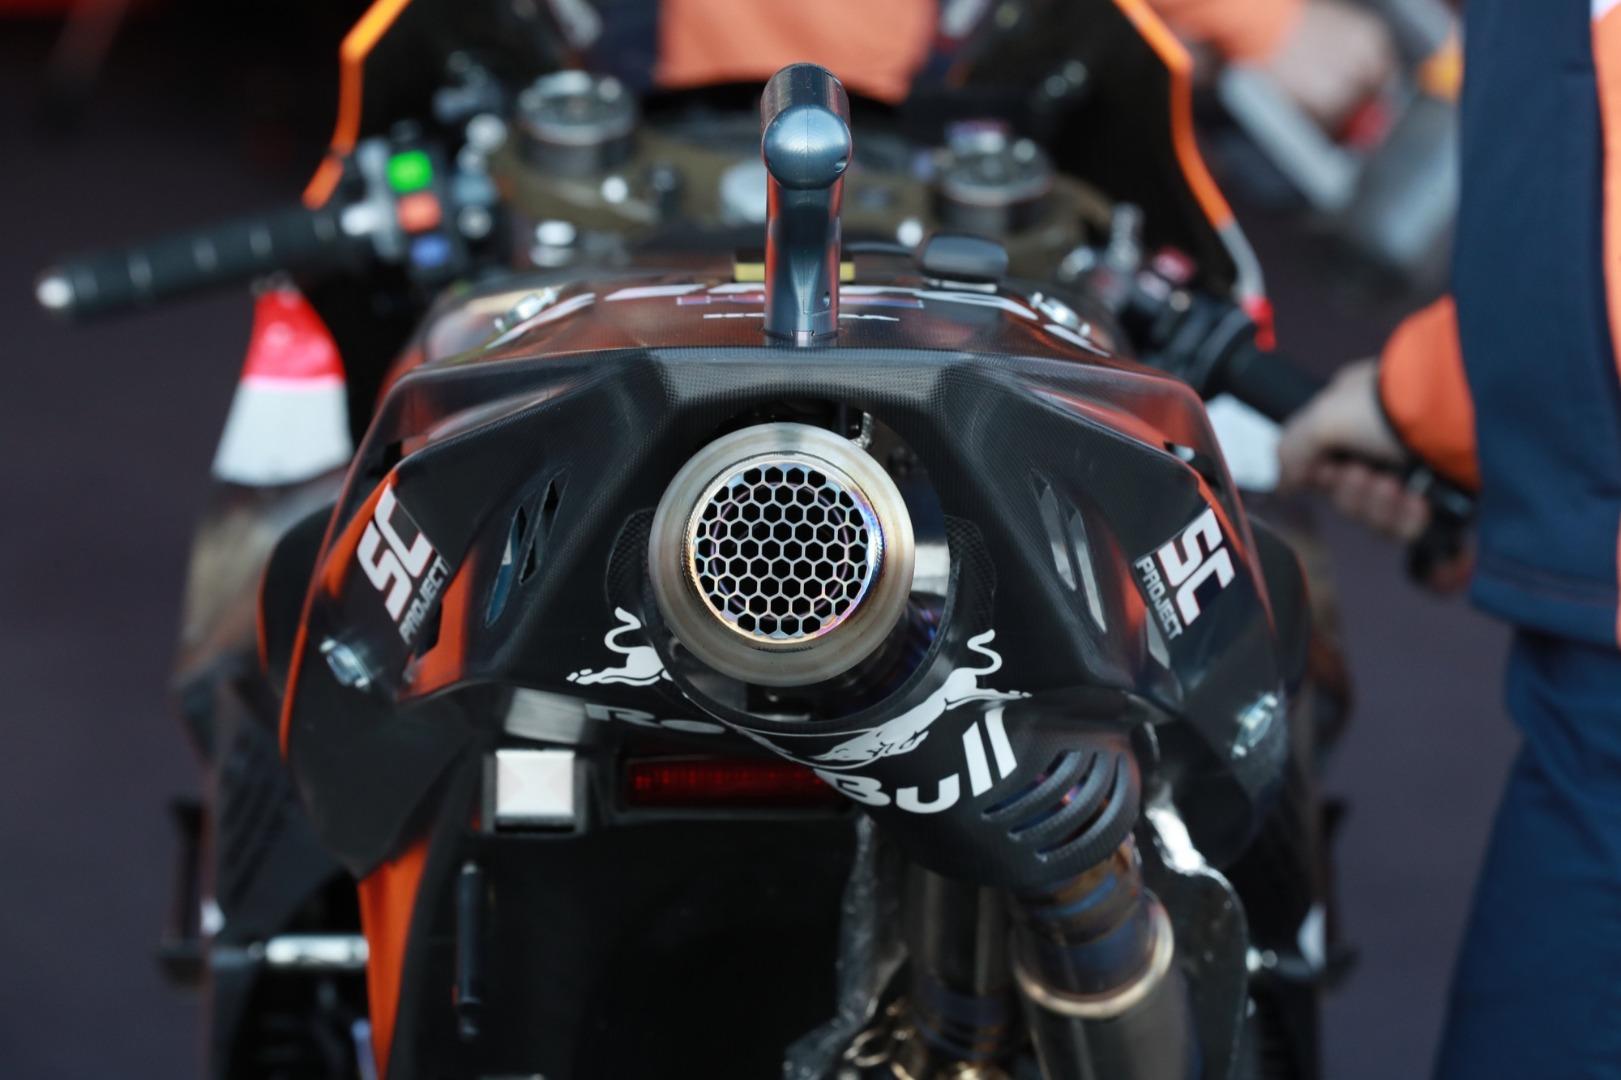 Honda RC-213V 2020 - Dos prototipos en pista, tres caídas